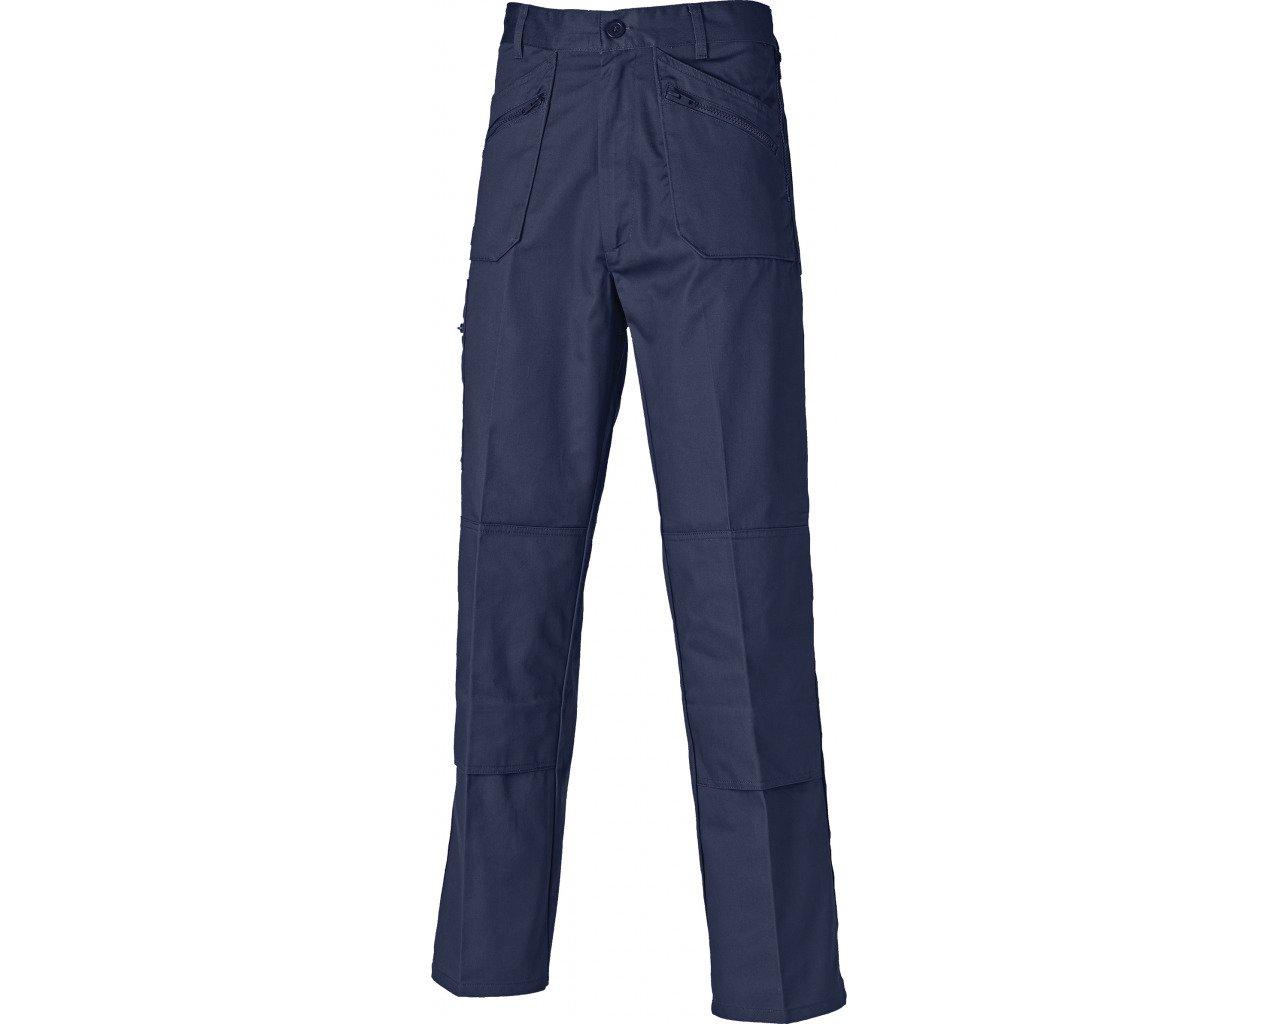 Grey 34T Grey Dickies Redhawk Action Work Trousers 102 EU